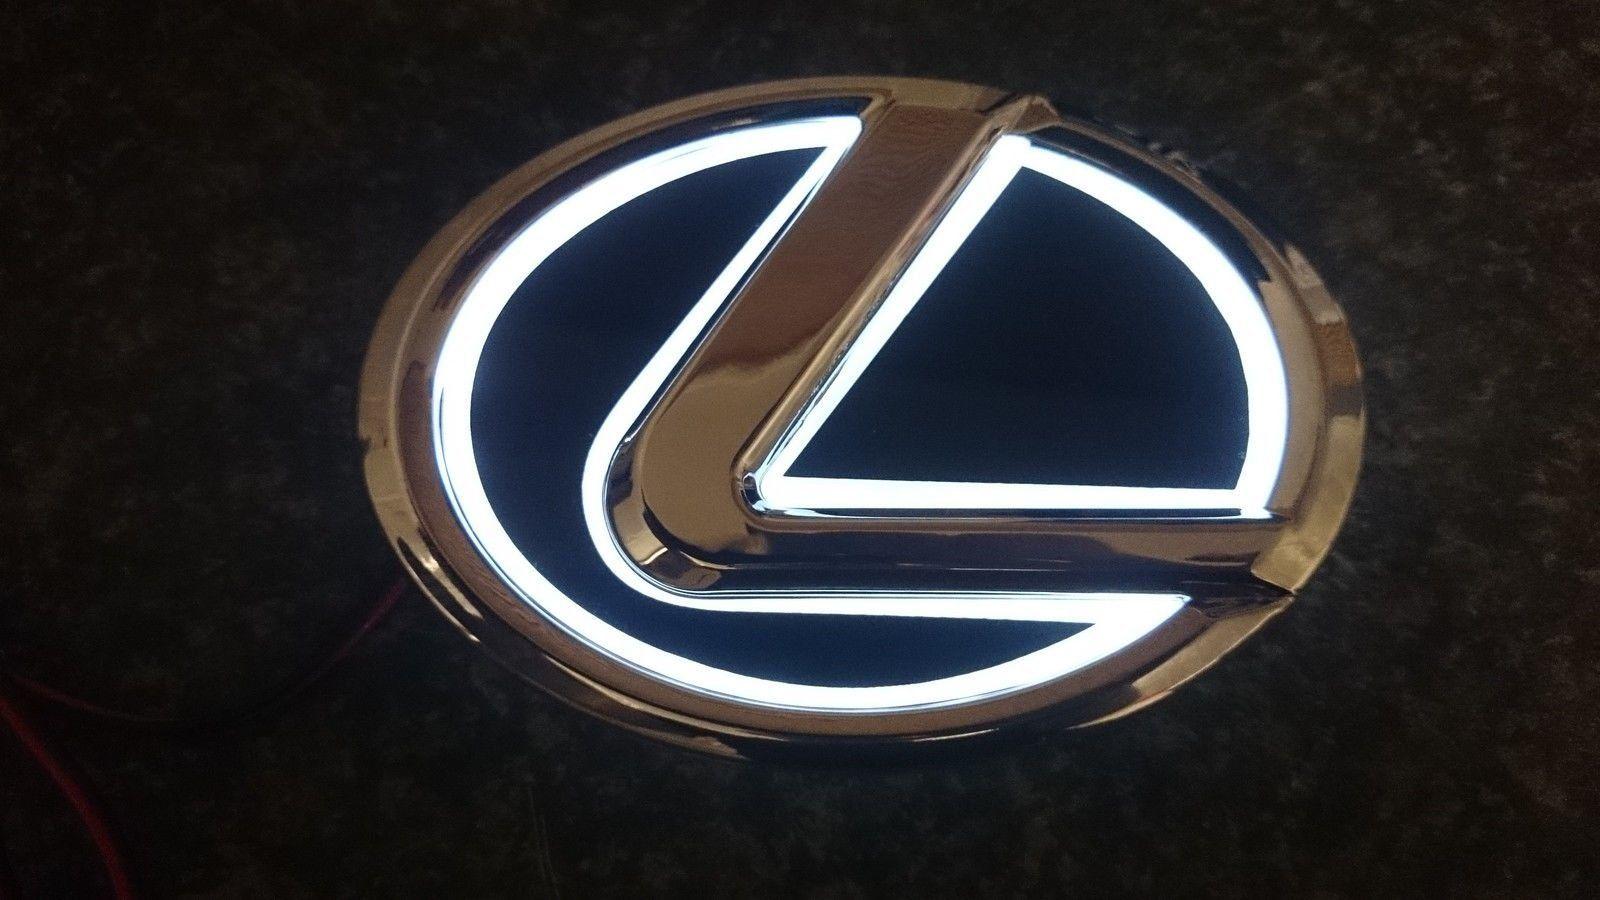 Idea by Chris Holbrook on LS430 Lexus, Car badges, Lexus